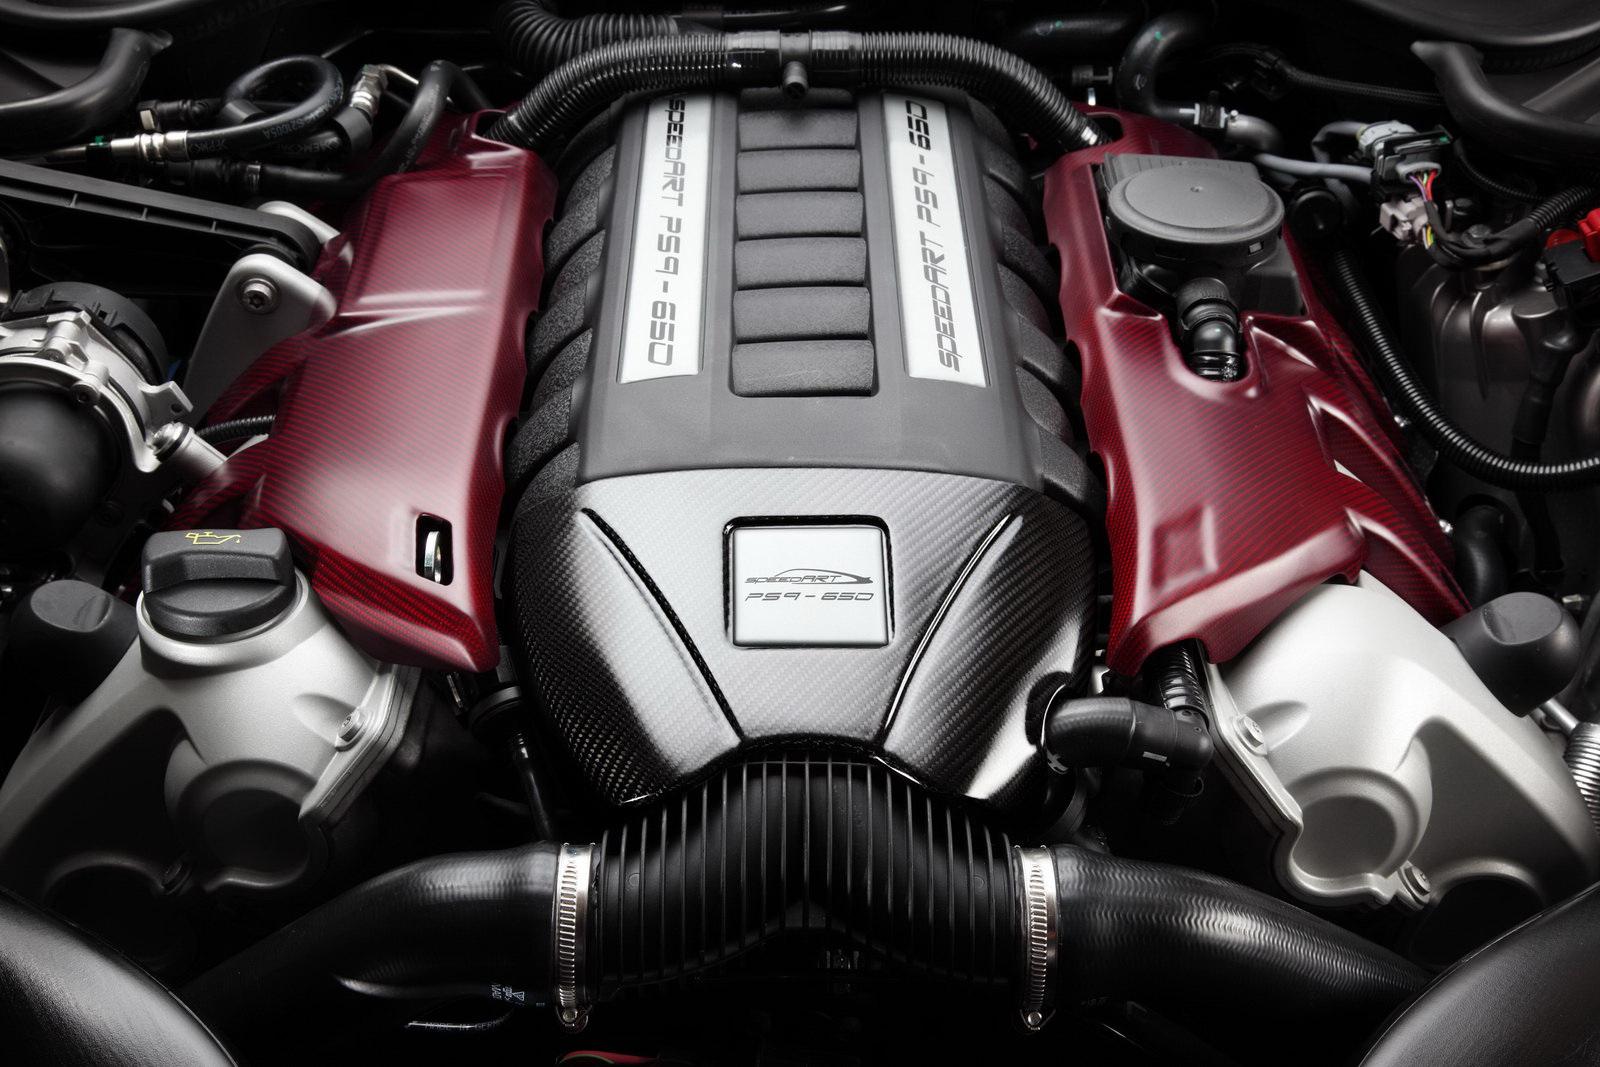 New Porsche Panamera Ps9 Unveiled At Essen Motor Show